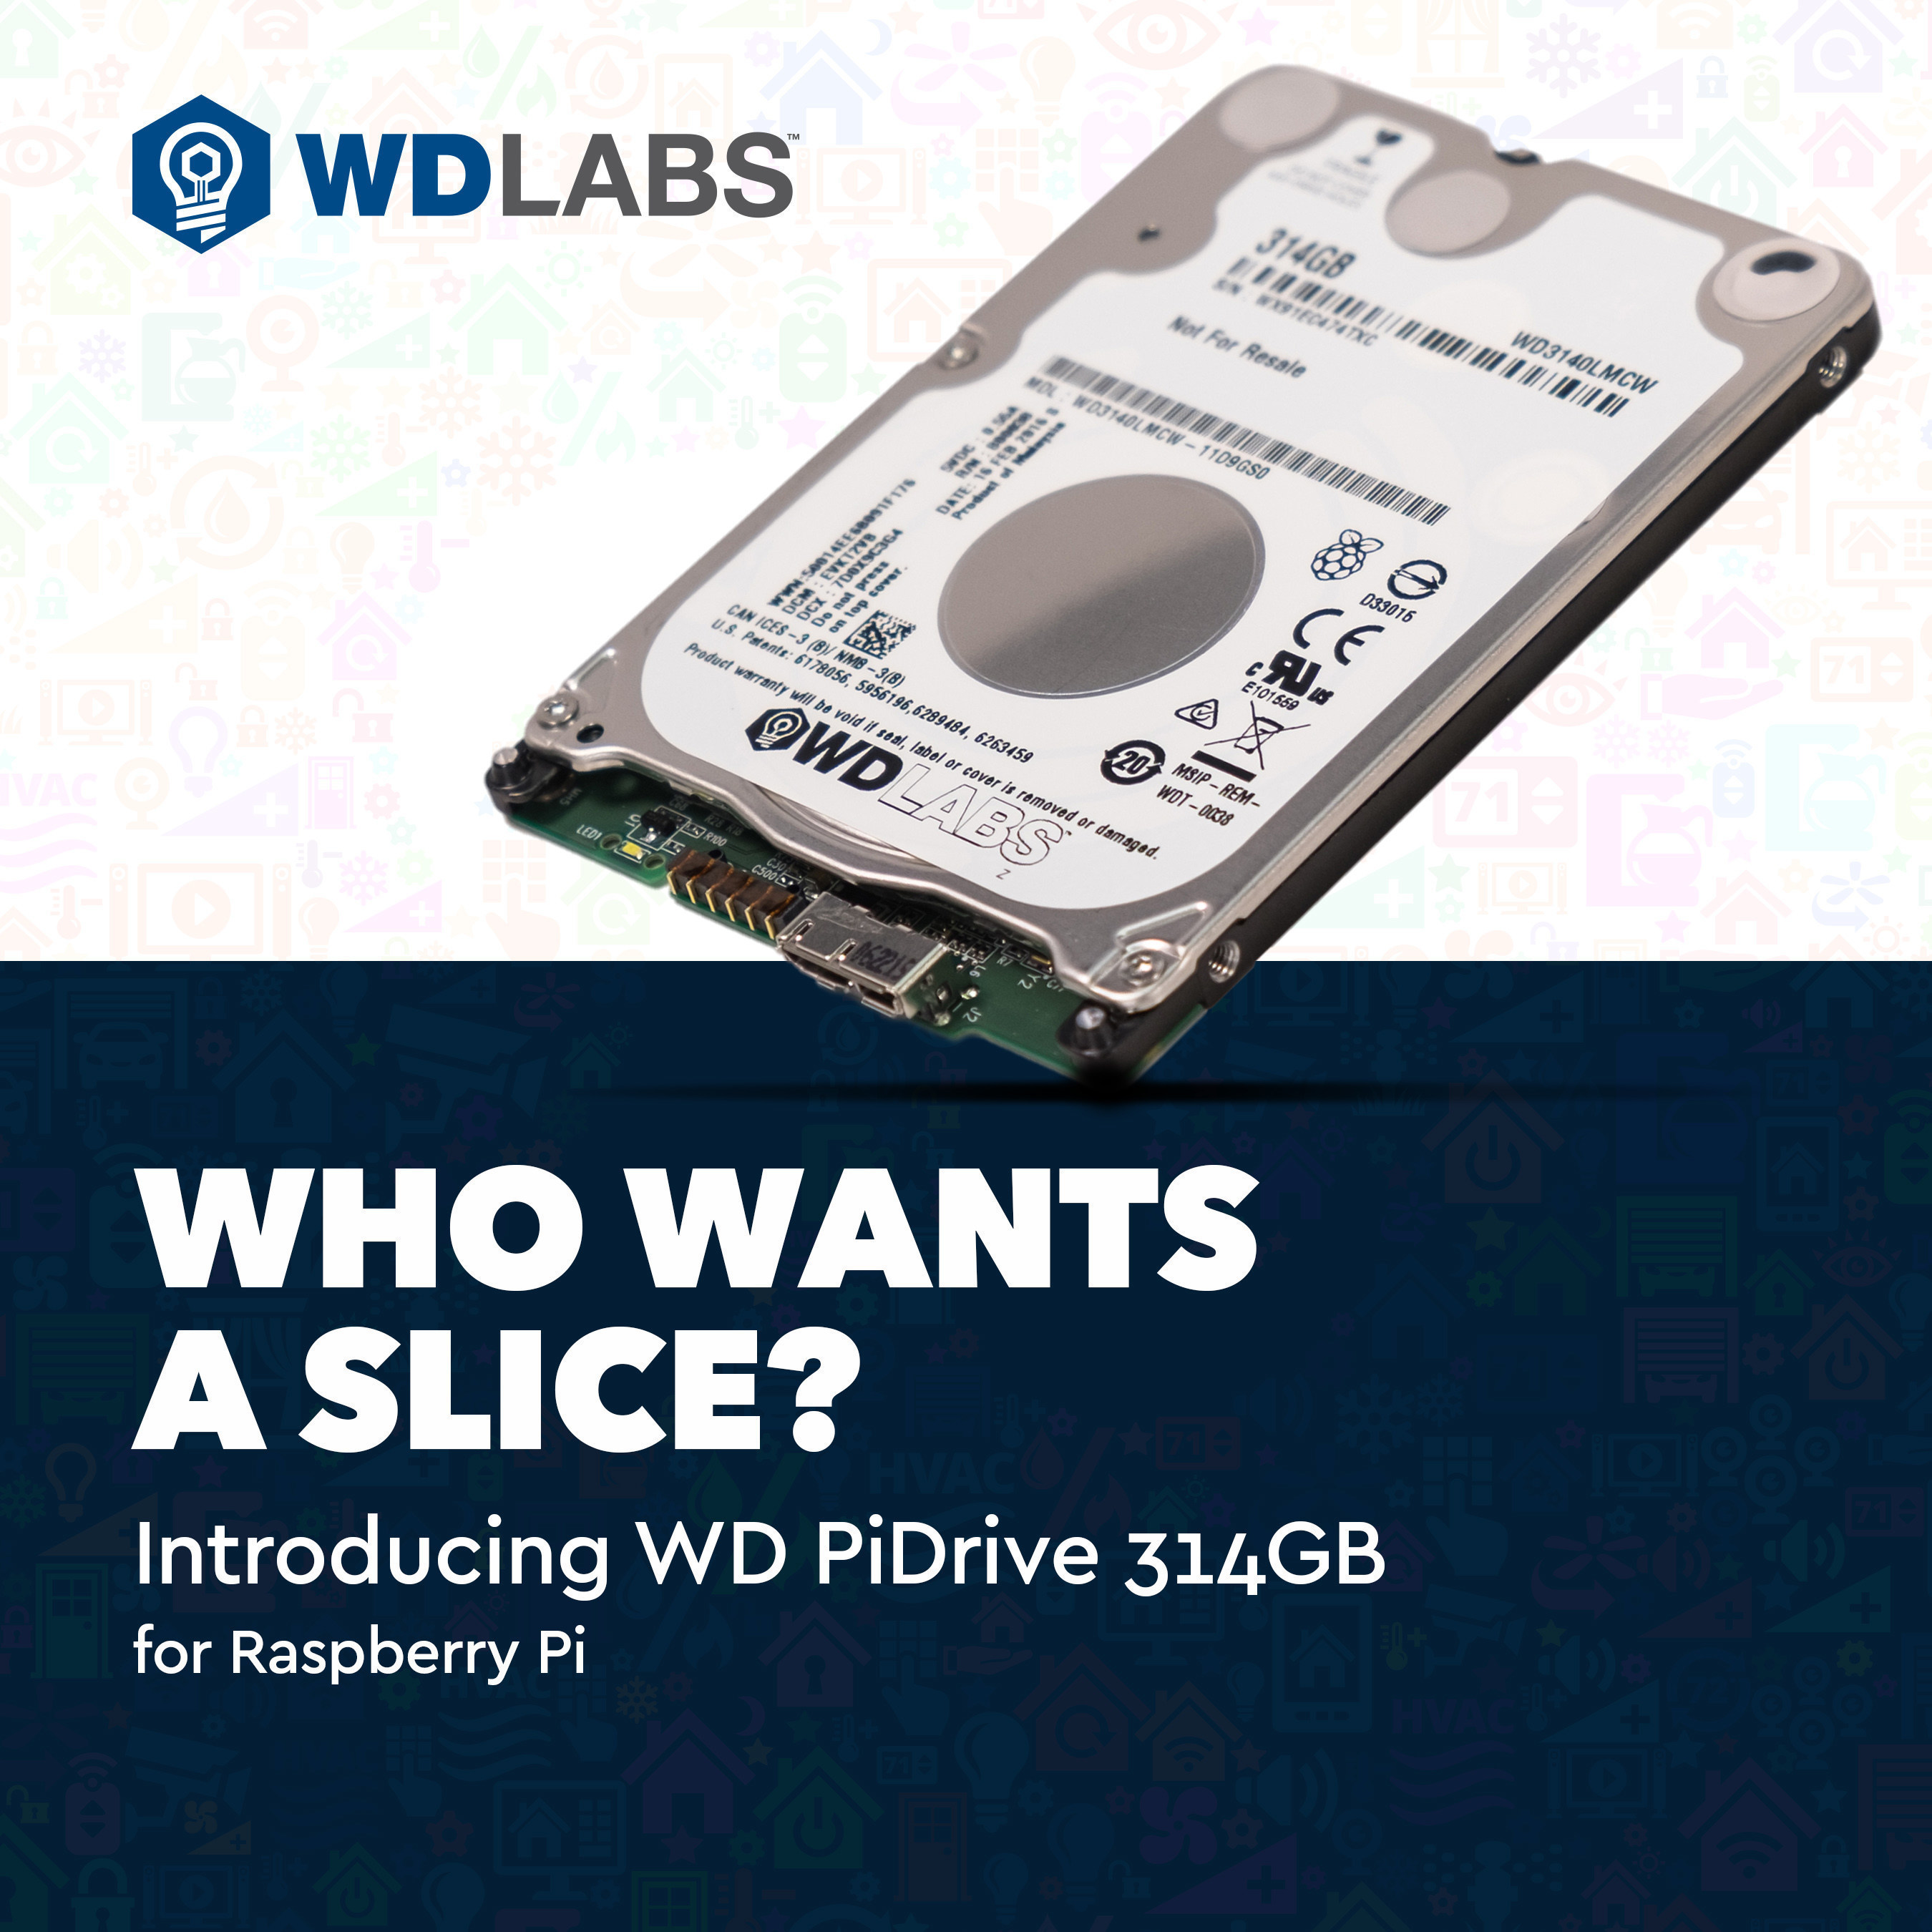 Western Digital Offers Growing Raspberry Pi Community New 314GB Drive